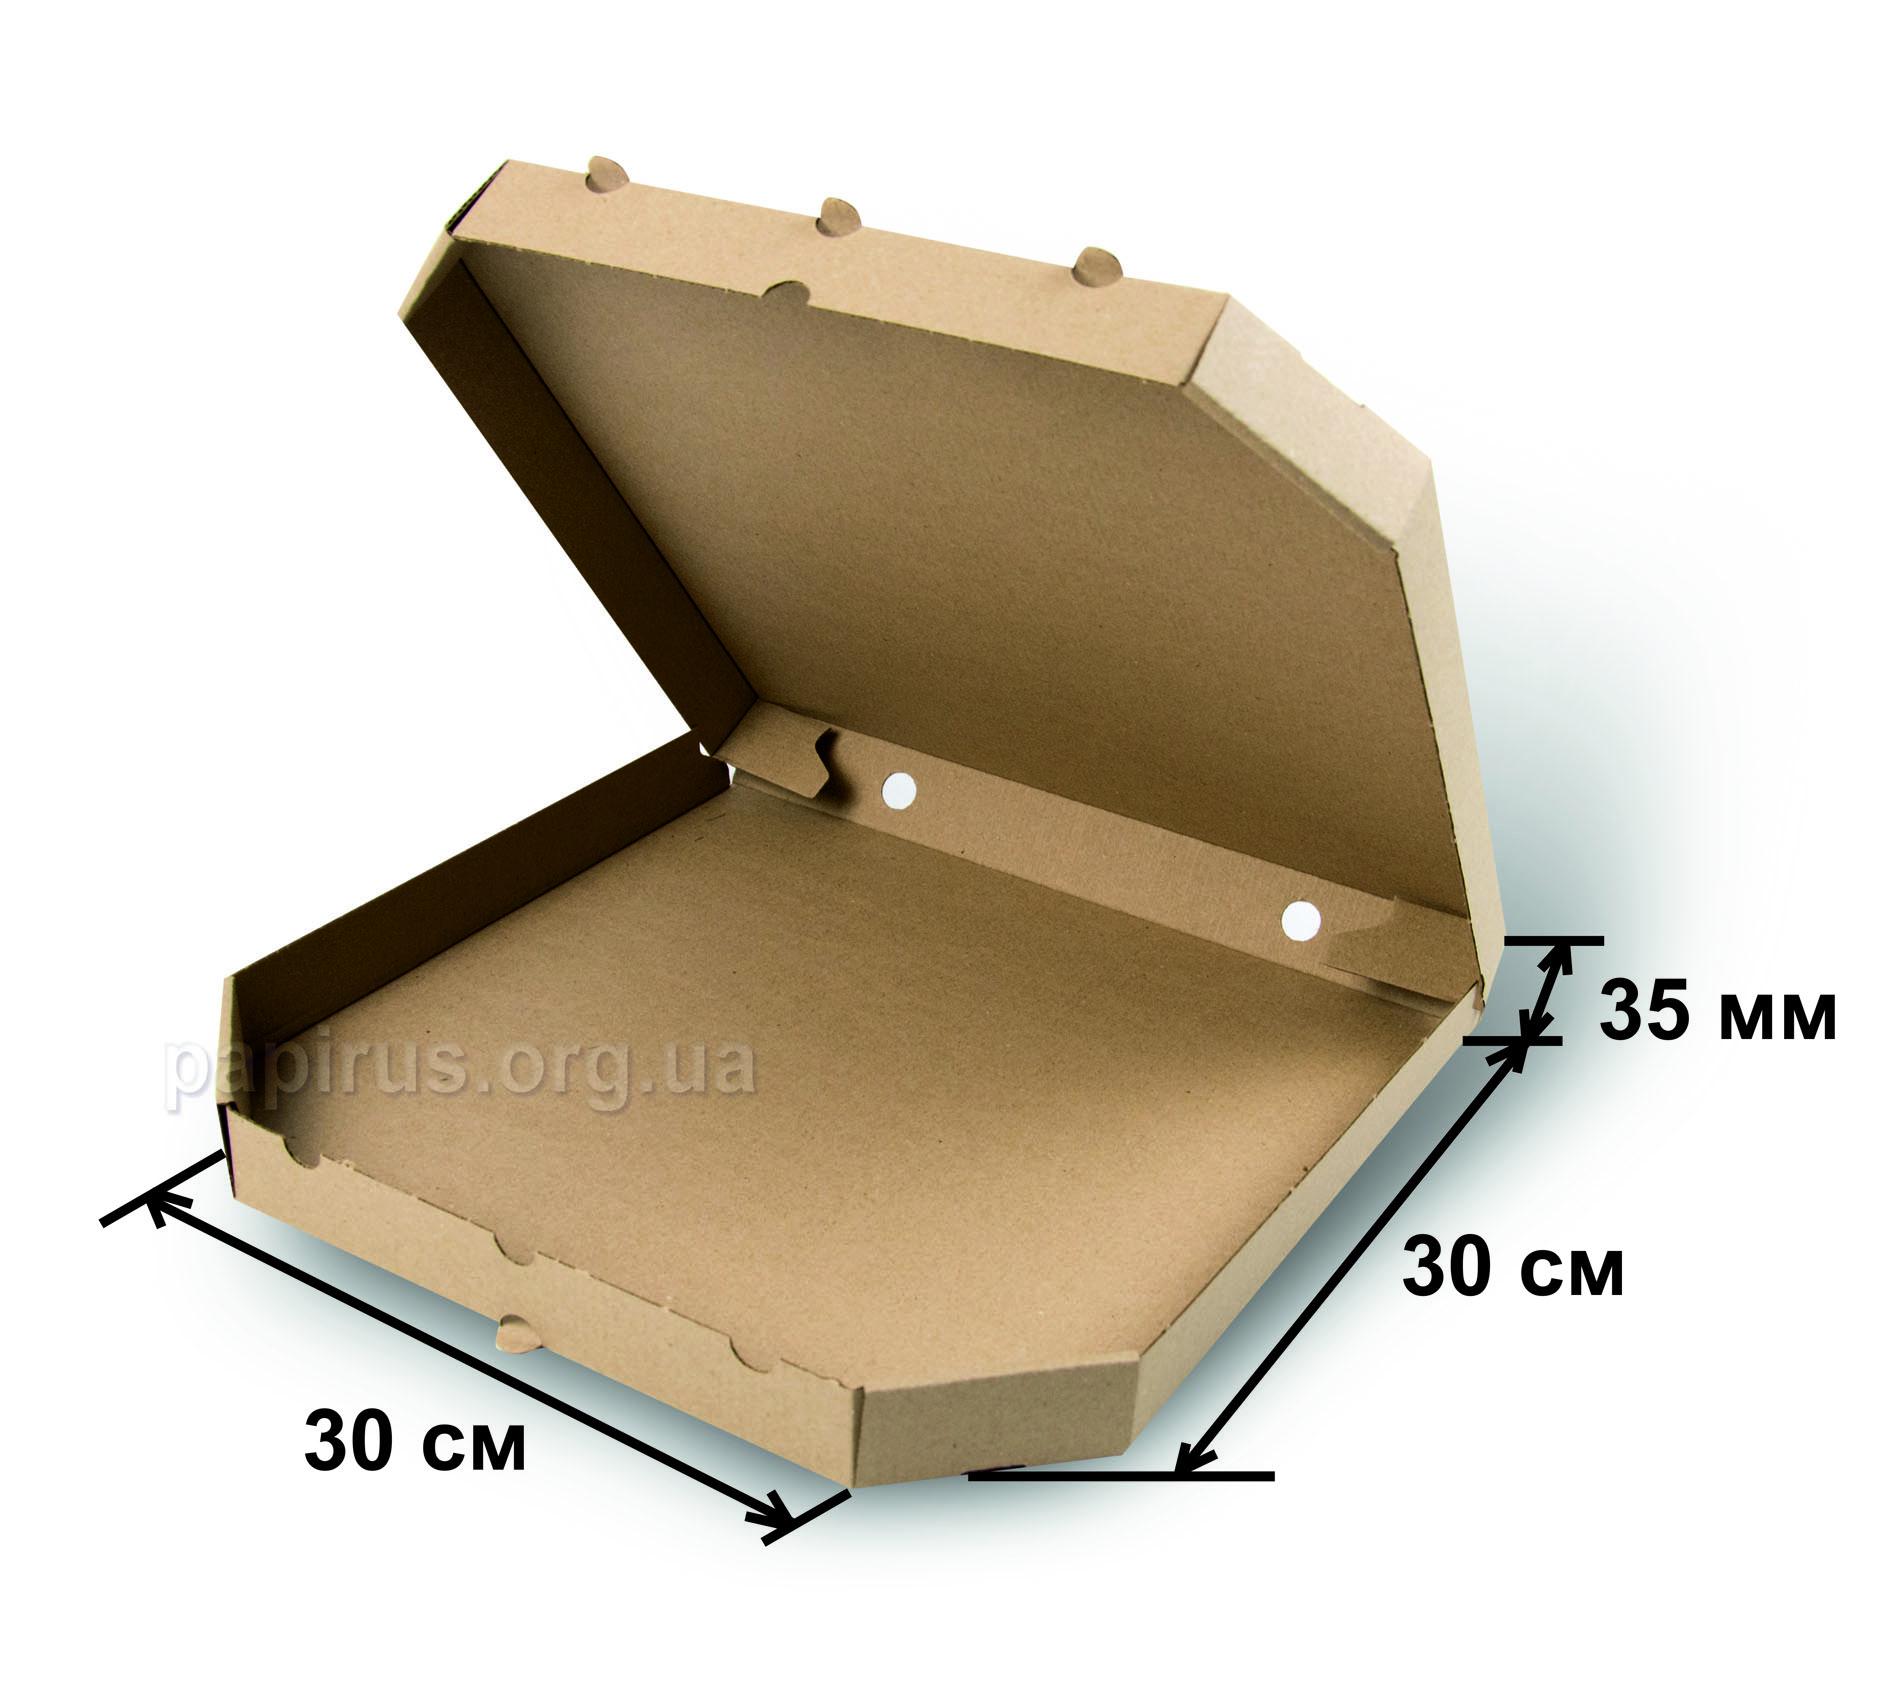 Коробка для пиццы бурая 300х300, г.Сумы, Типография Папирус